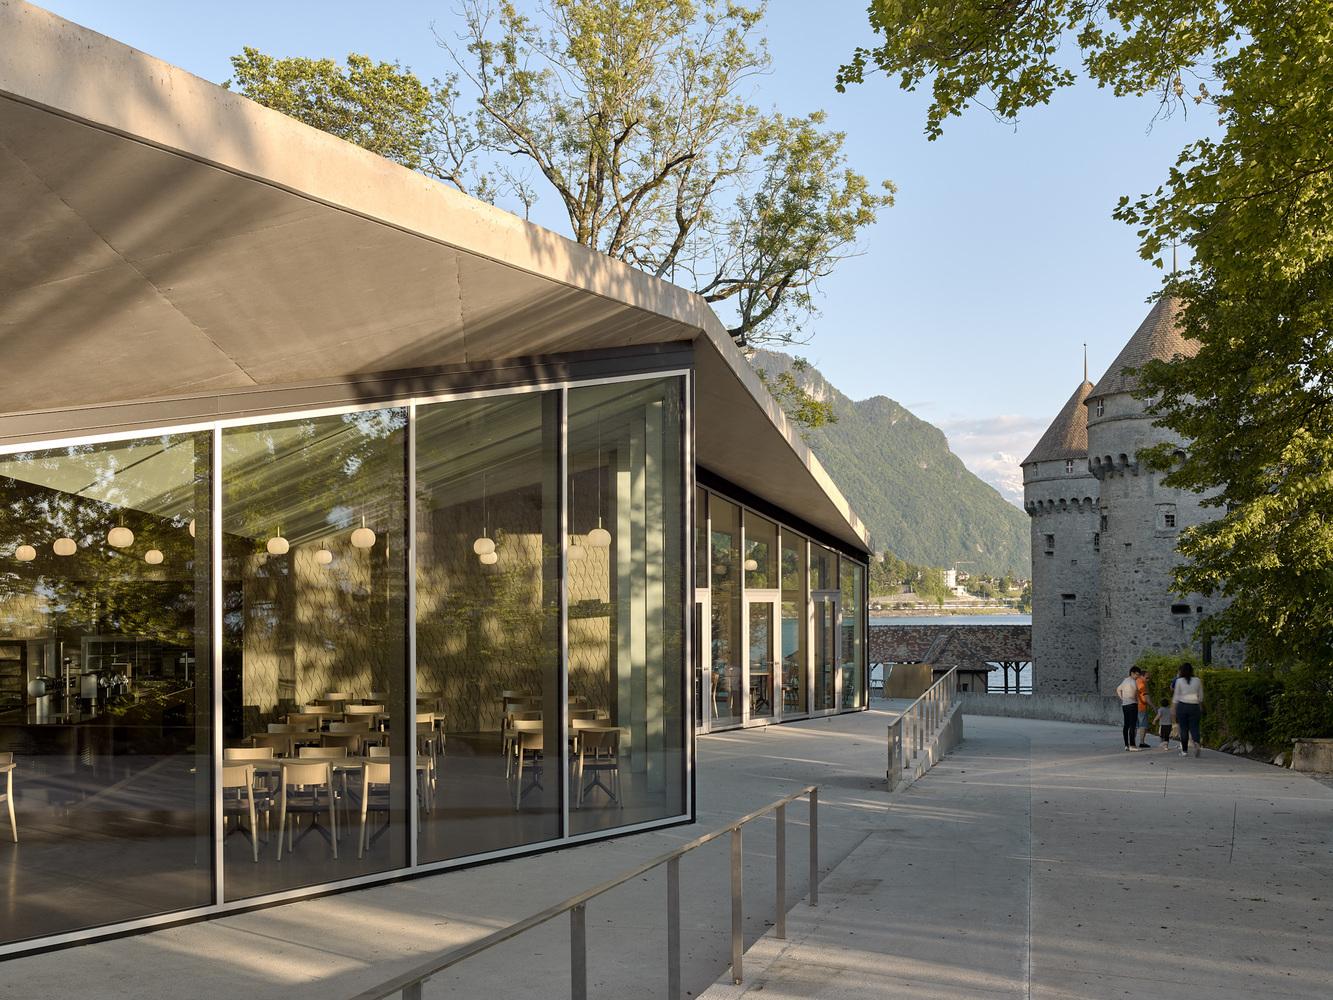 Dreier Frenzel Architecture + Communication